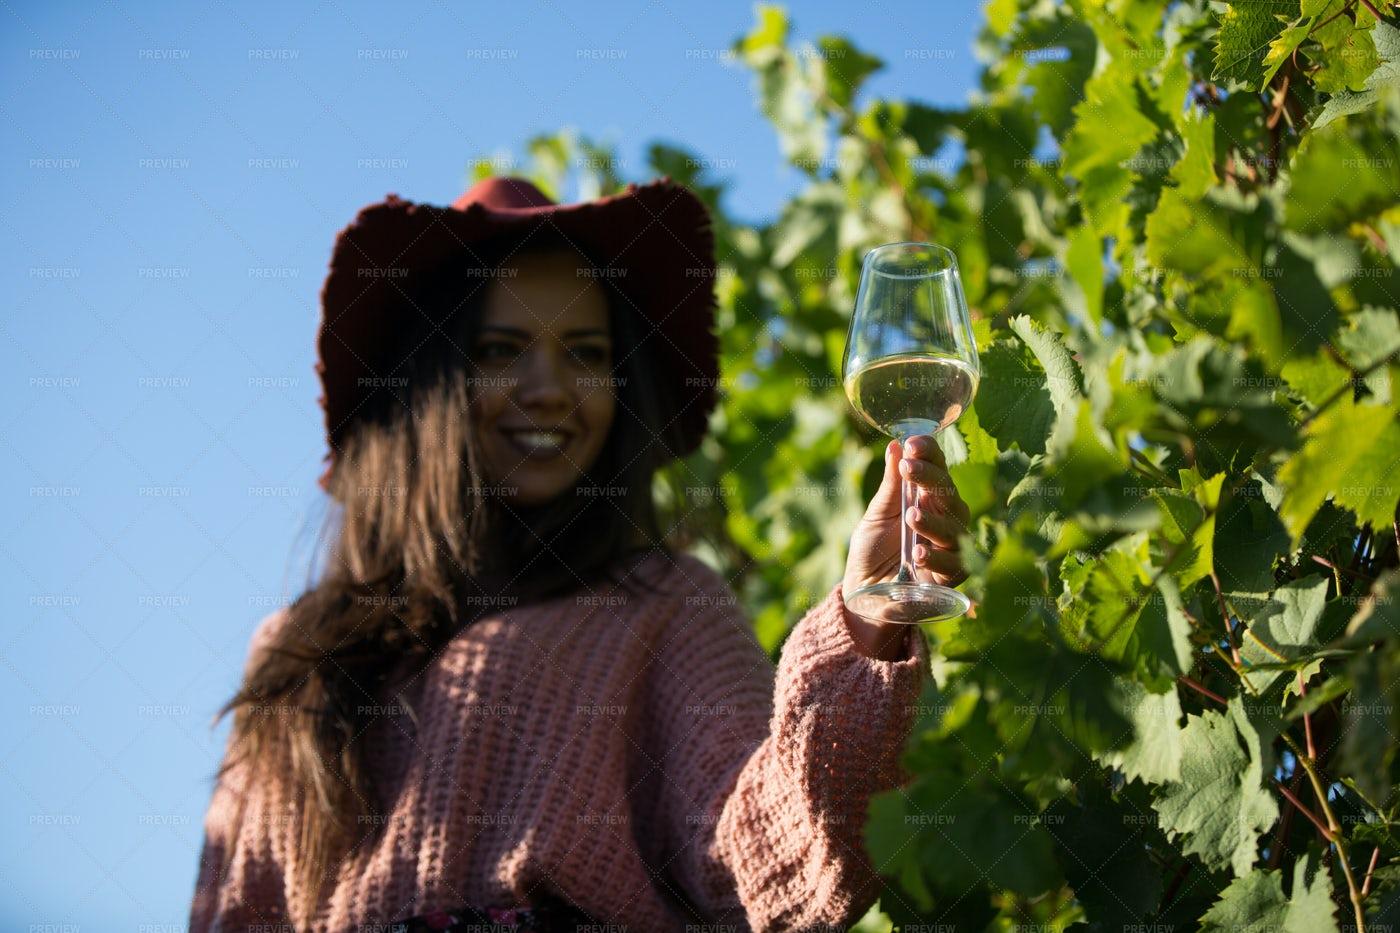 Tasting Winery's White Wine: Stock Photos